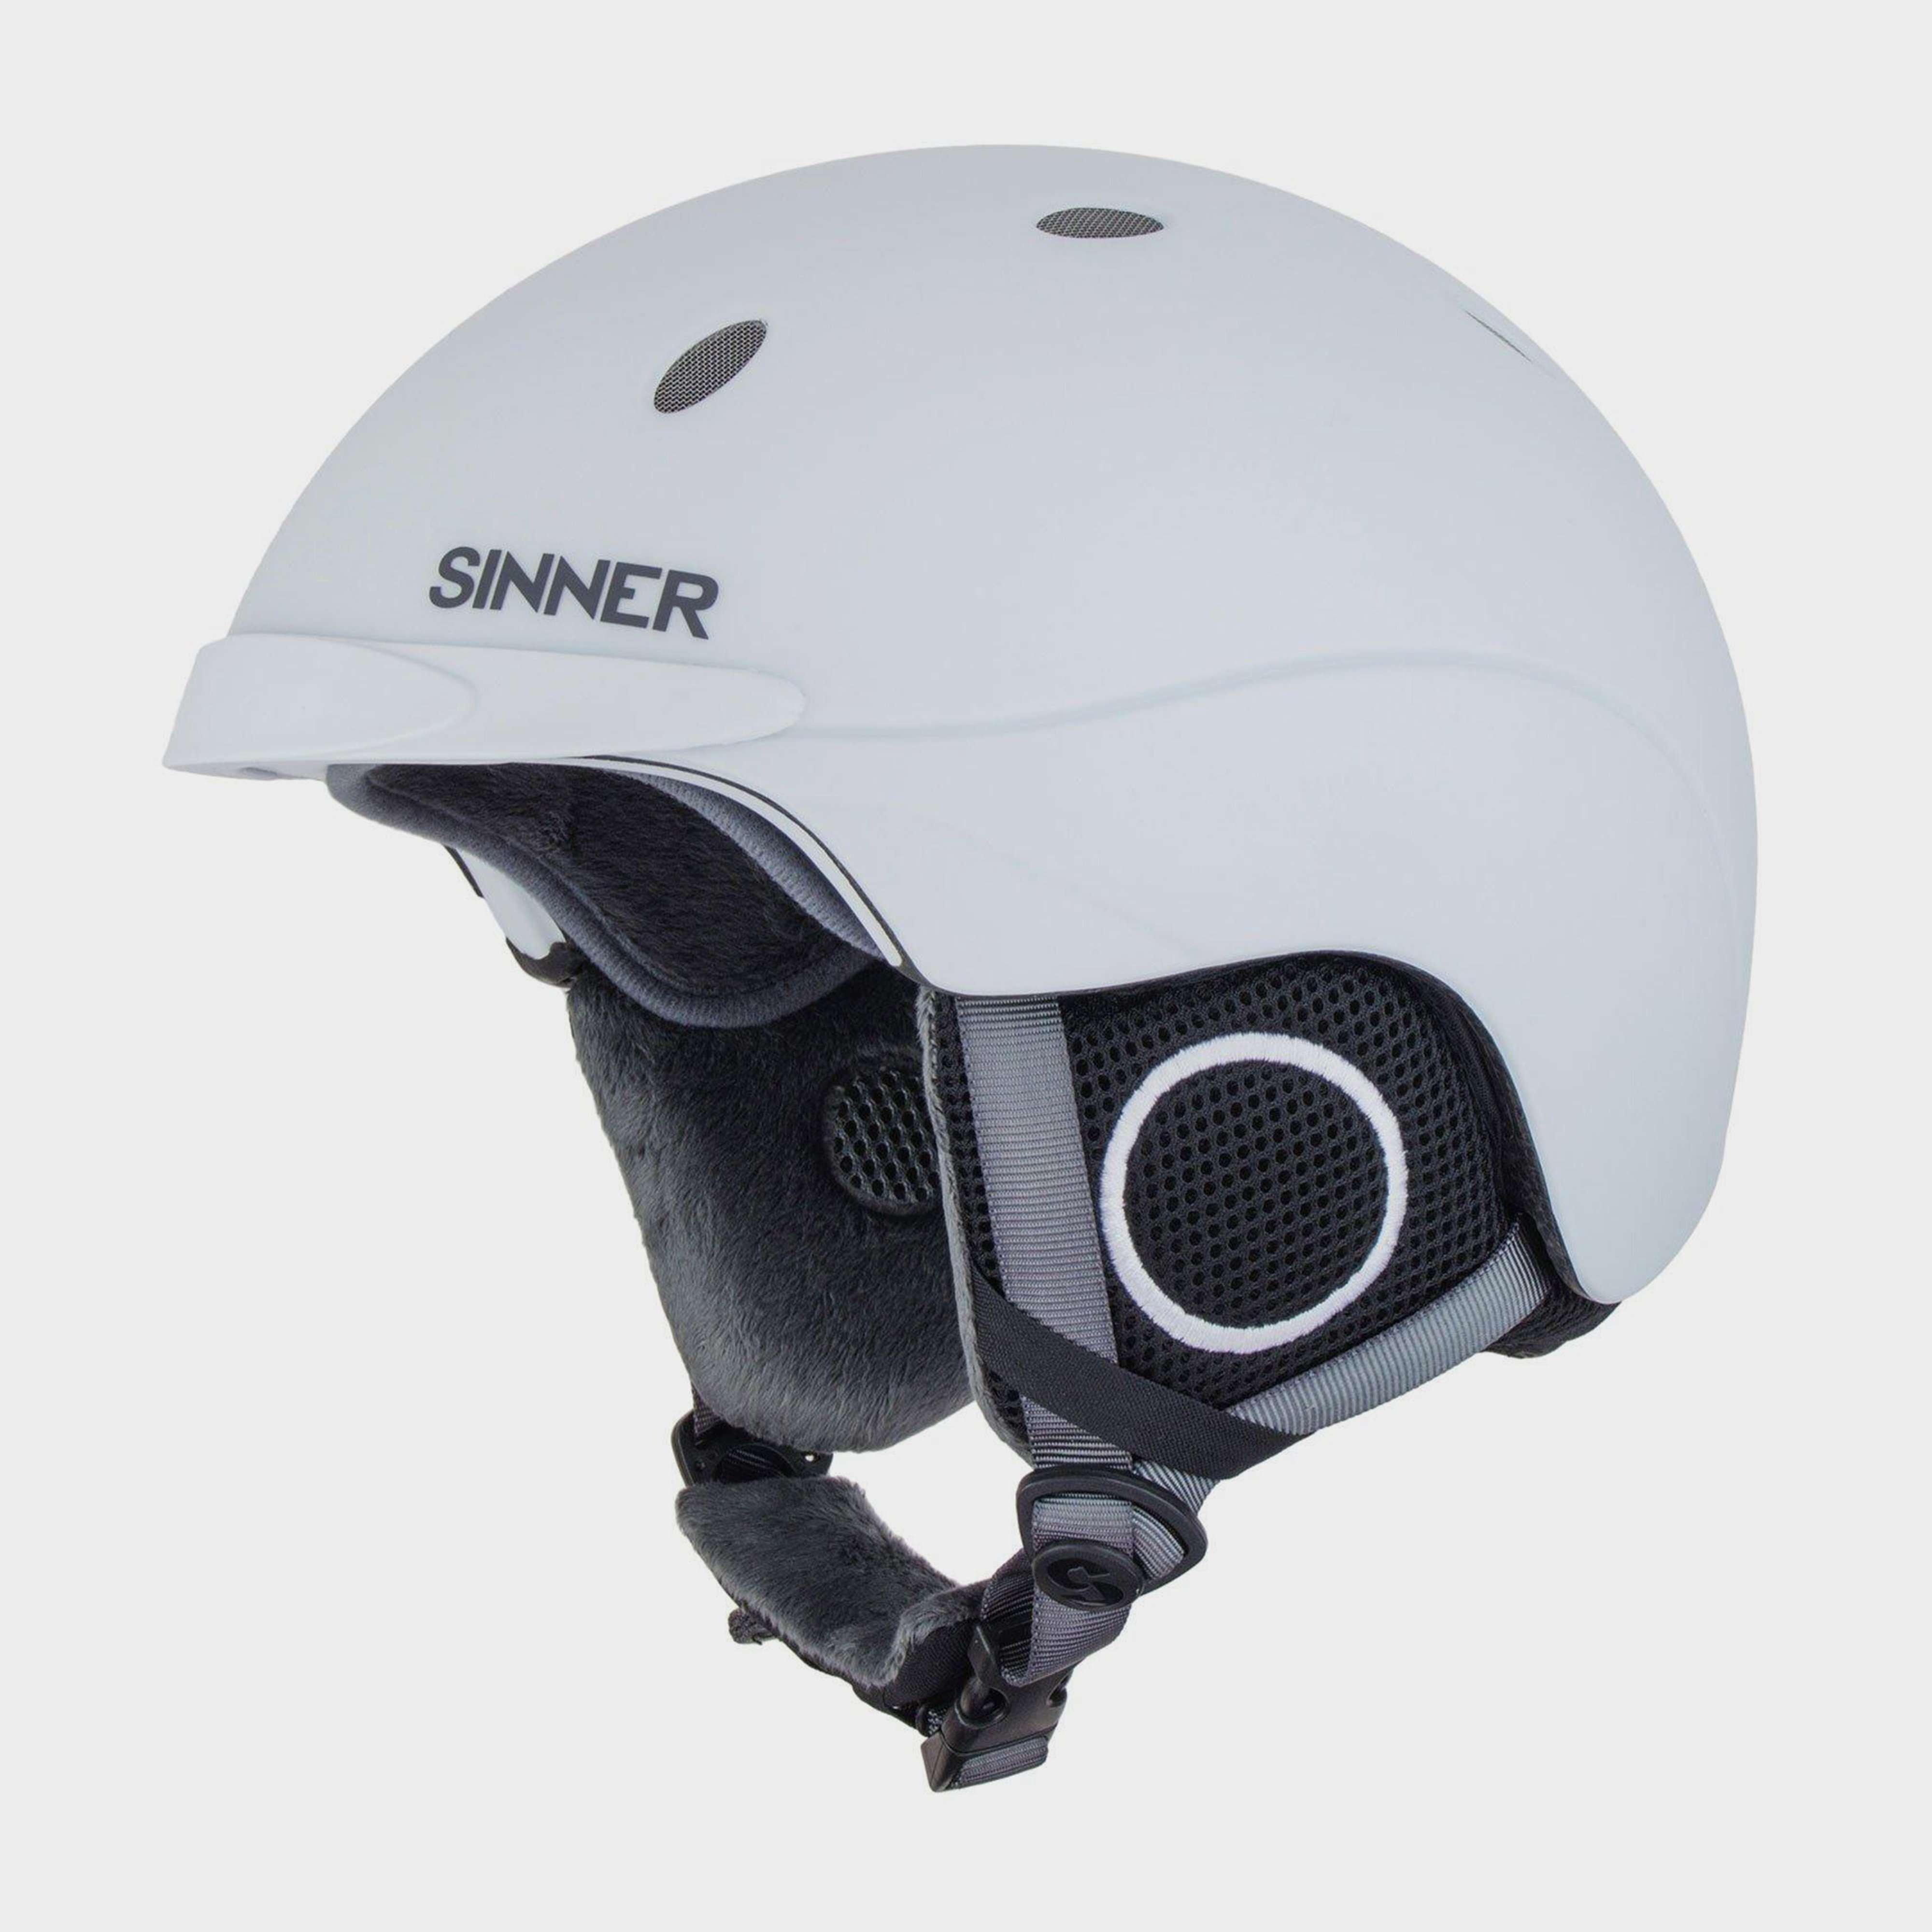 SINNER Titan Helmet